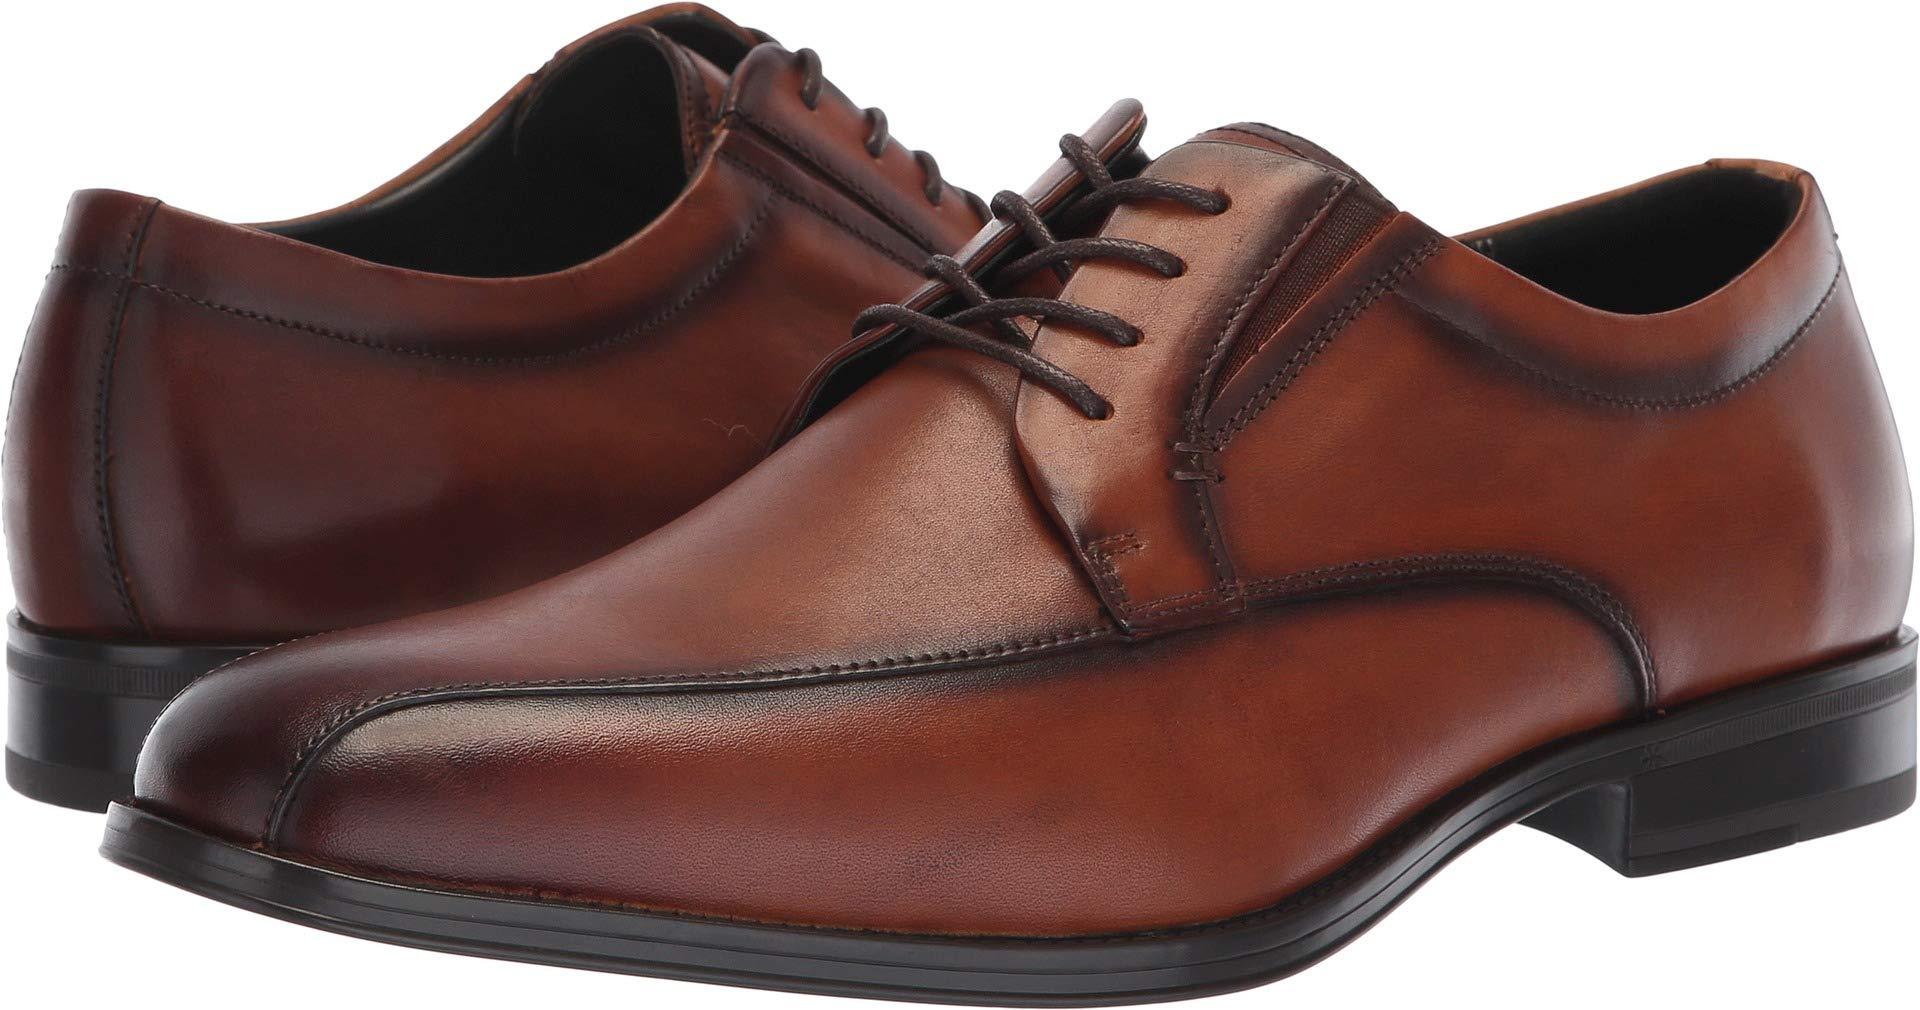 ALDO Men's Spakeman Uniform Dress Shoe, Cognac, 10.5 by ALDO